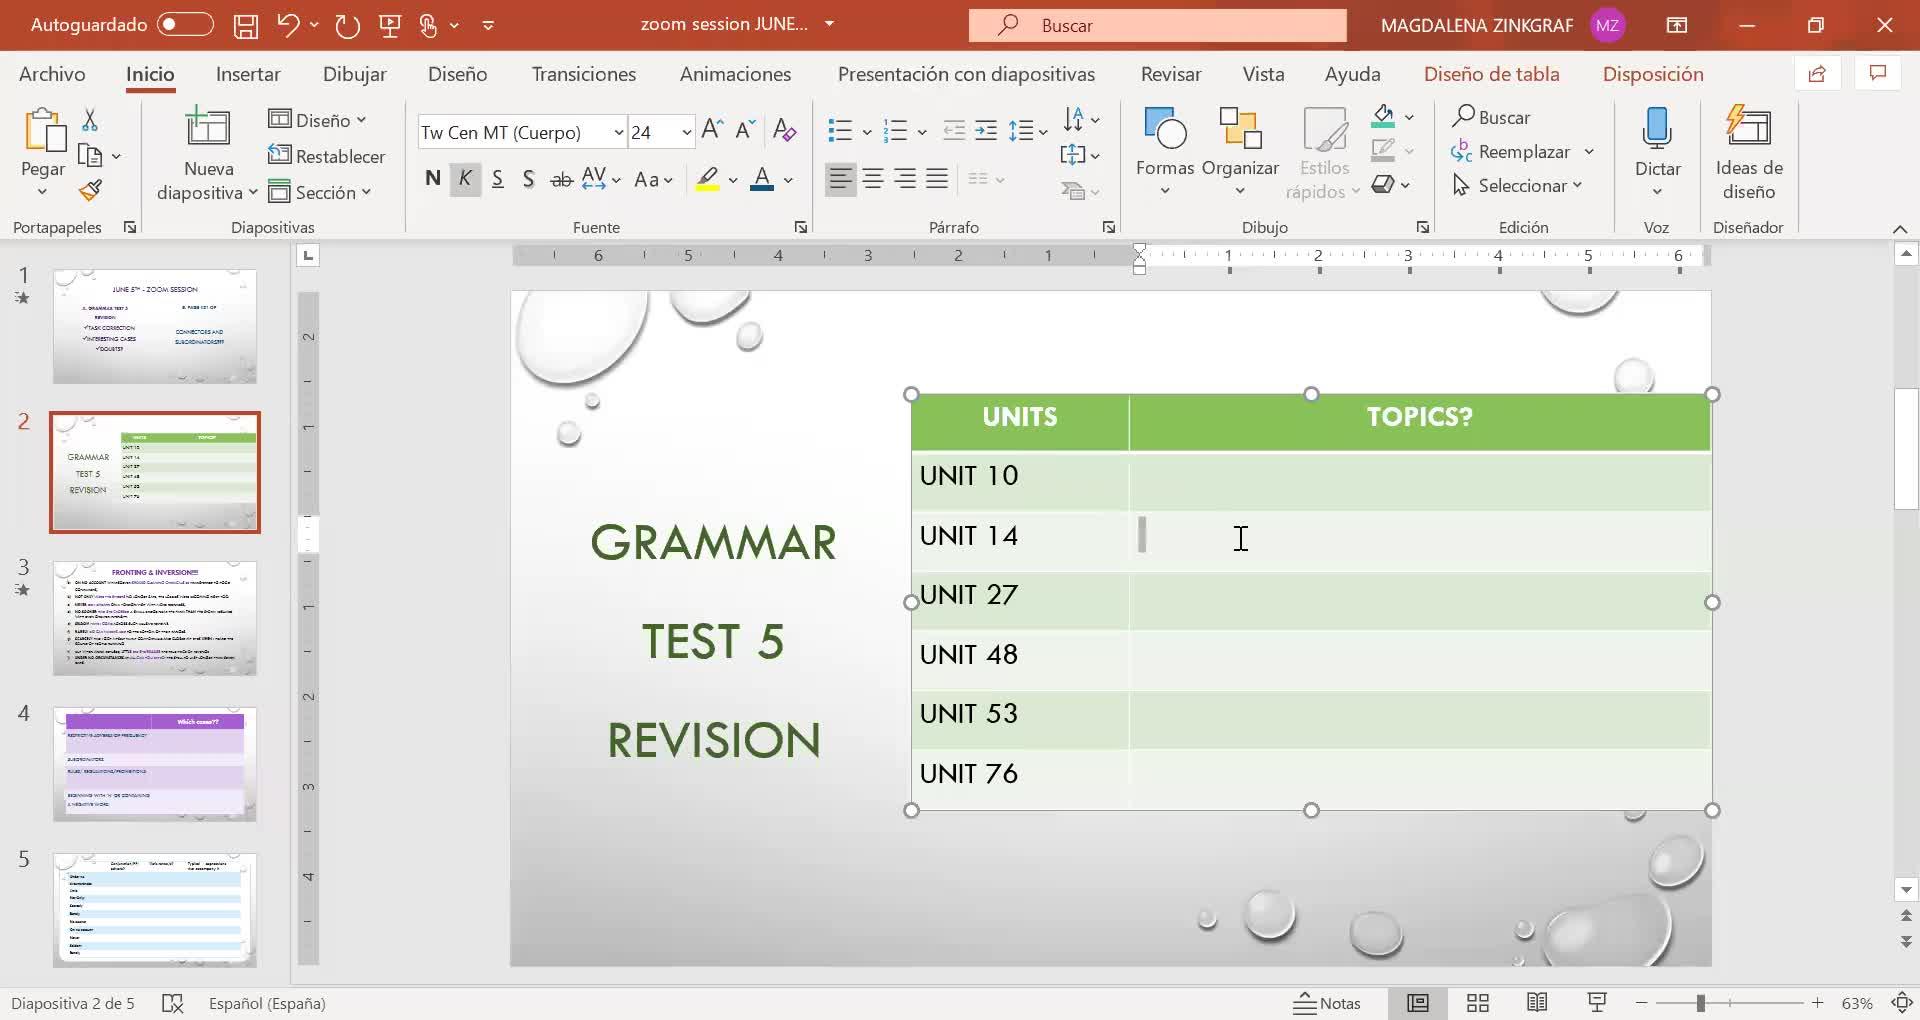 LI3 june 5 grt5 revision a